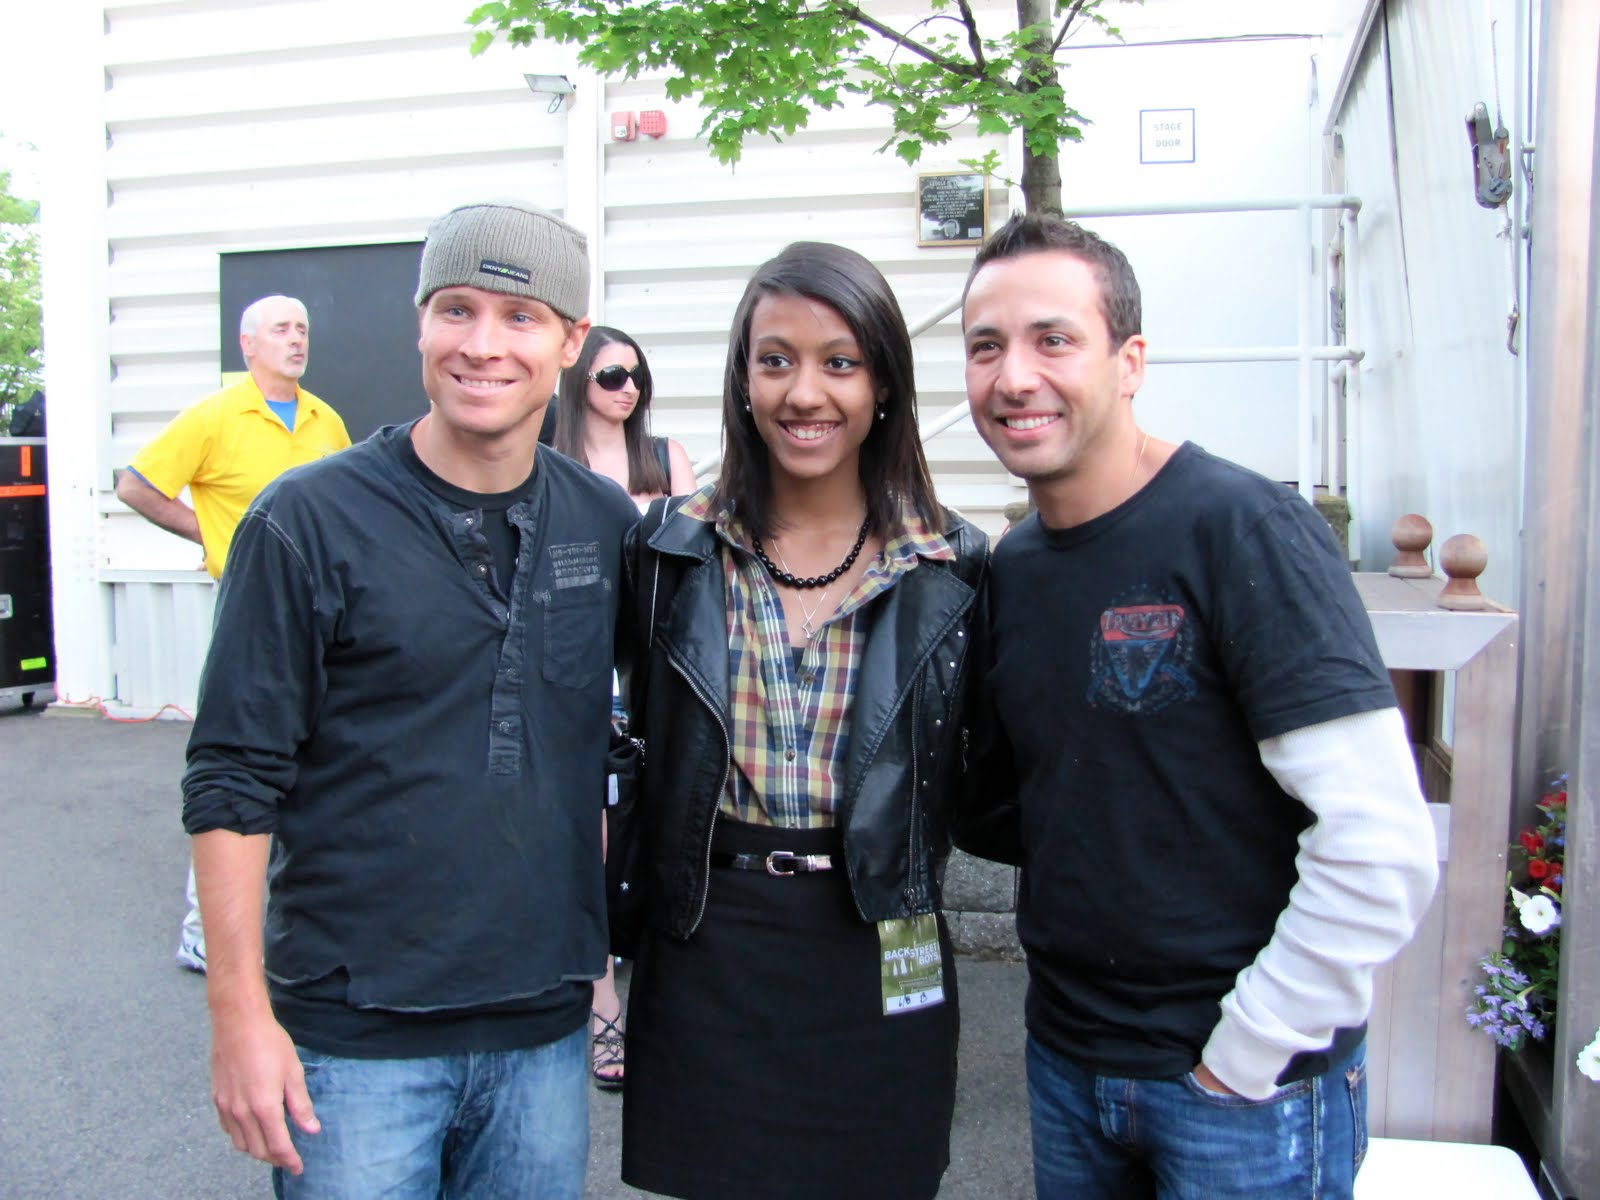 114108666 The Backstreet Boys in Boston. 6/13/2010 11:12:00 AM AJ McLean News No ...